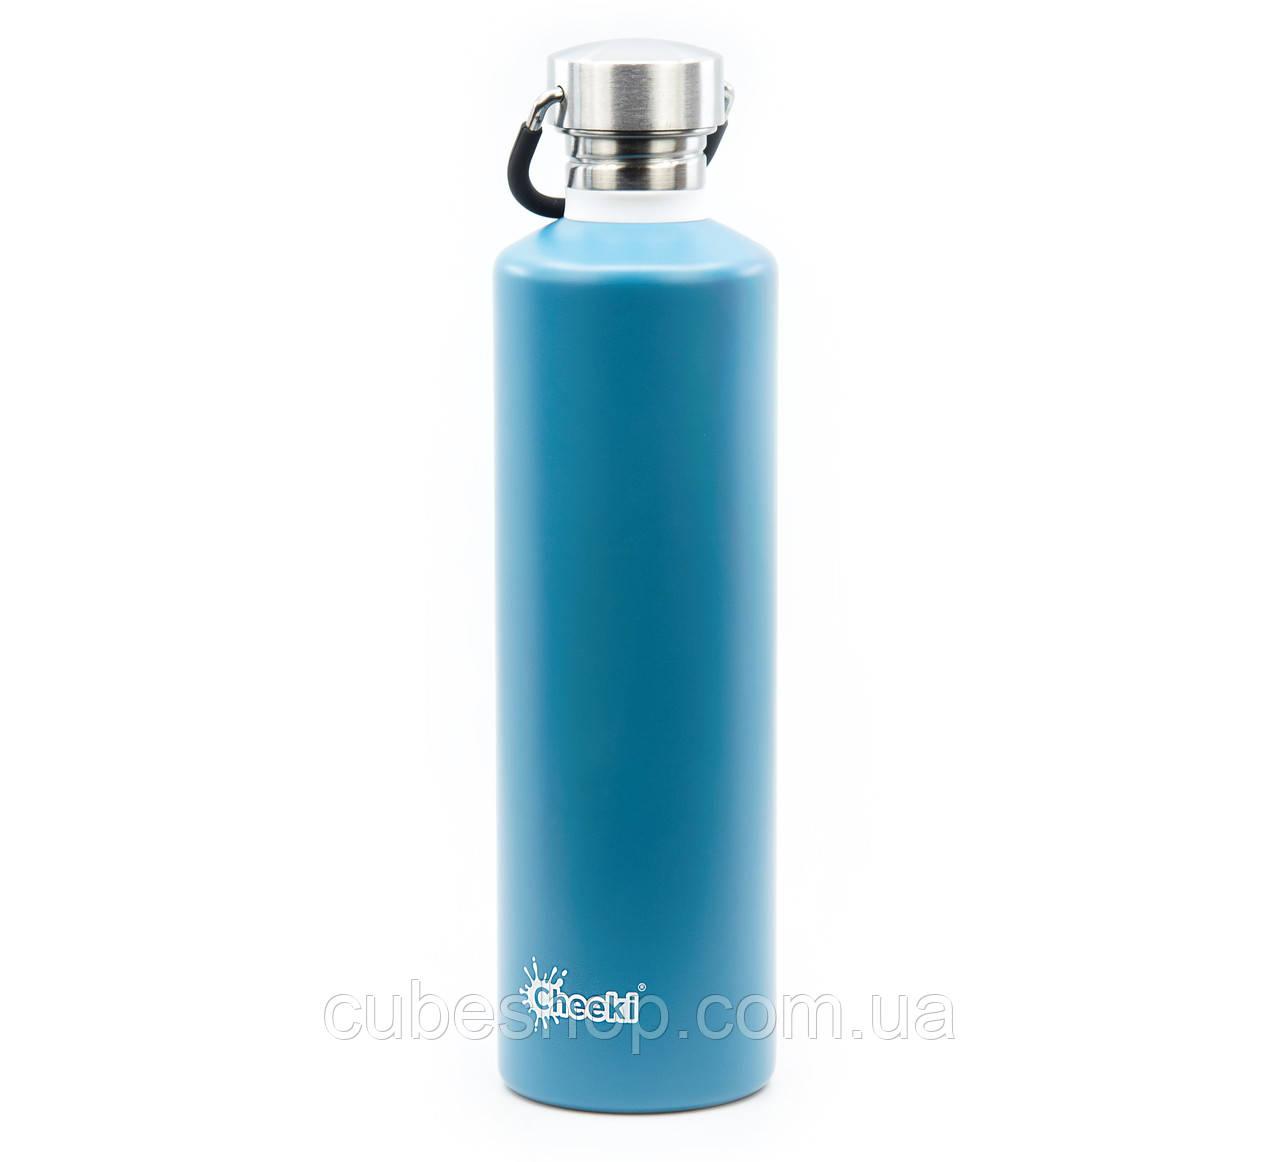 Бутылка для воды Cheeki Classic Single Wall Topaz (1 литр)